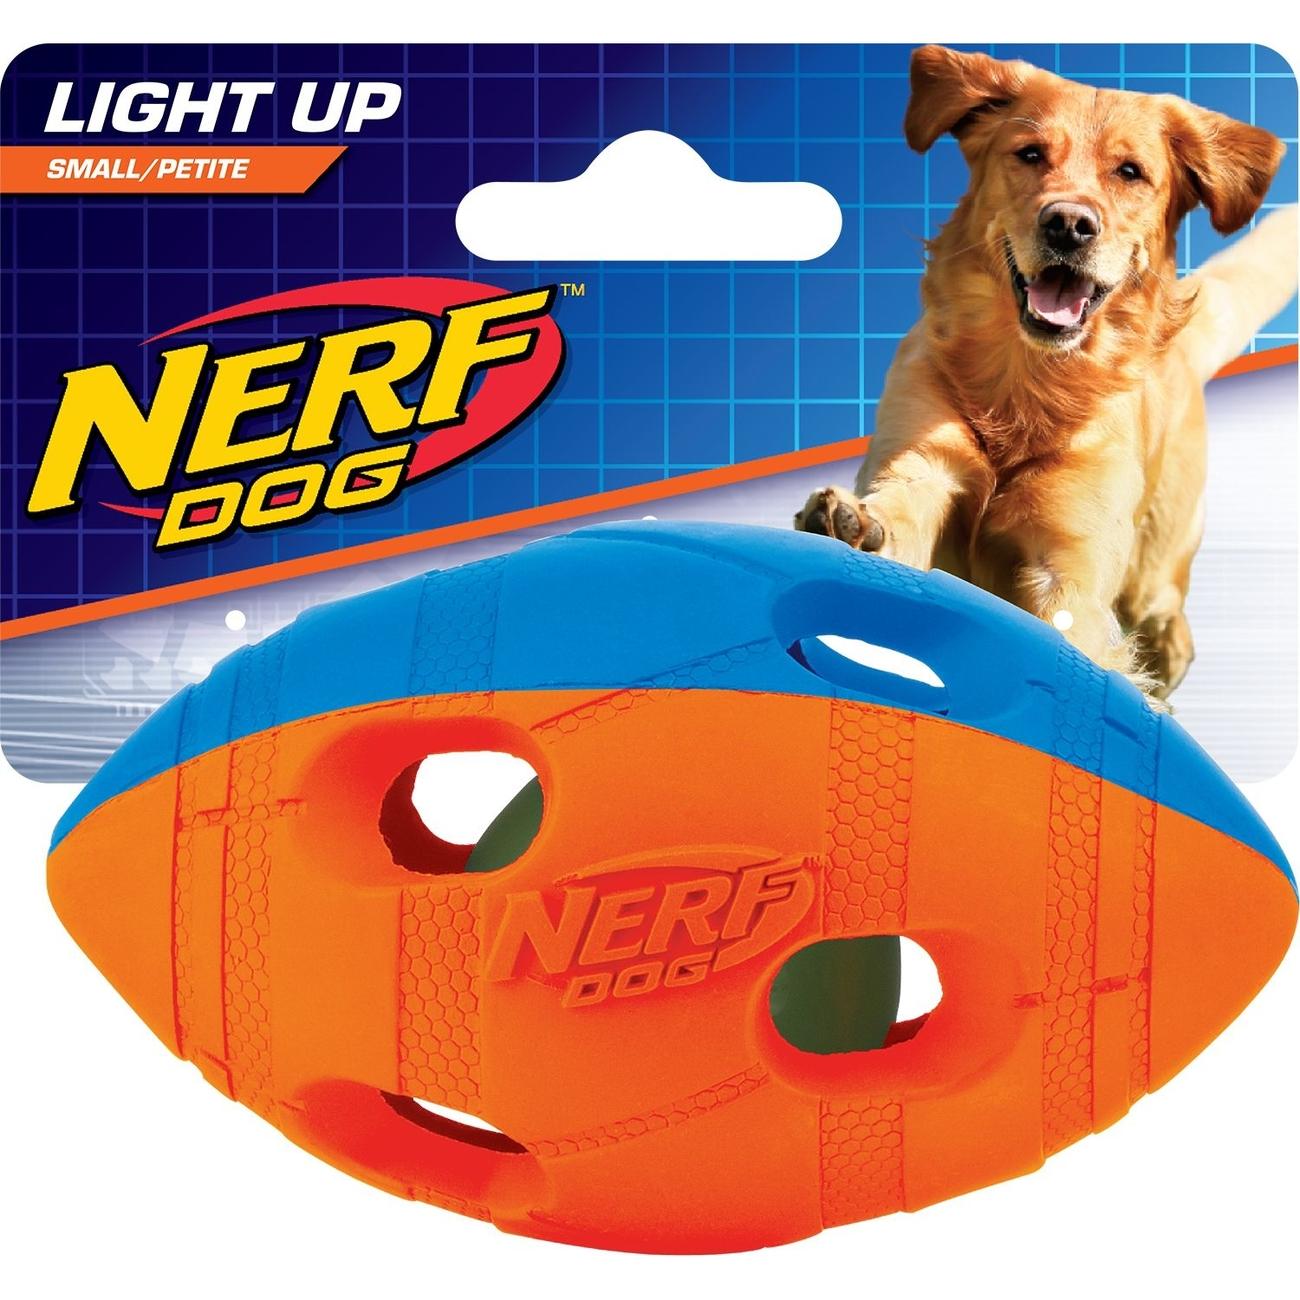 NERF Dog lluma-Action LED für Hunde, Bild 3